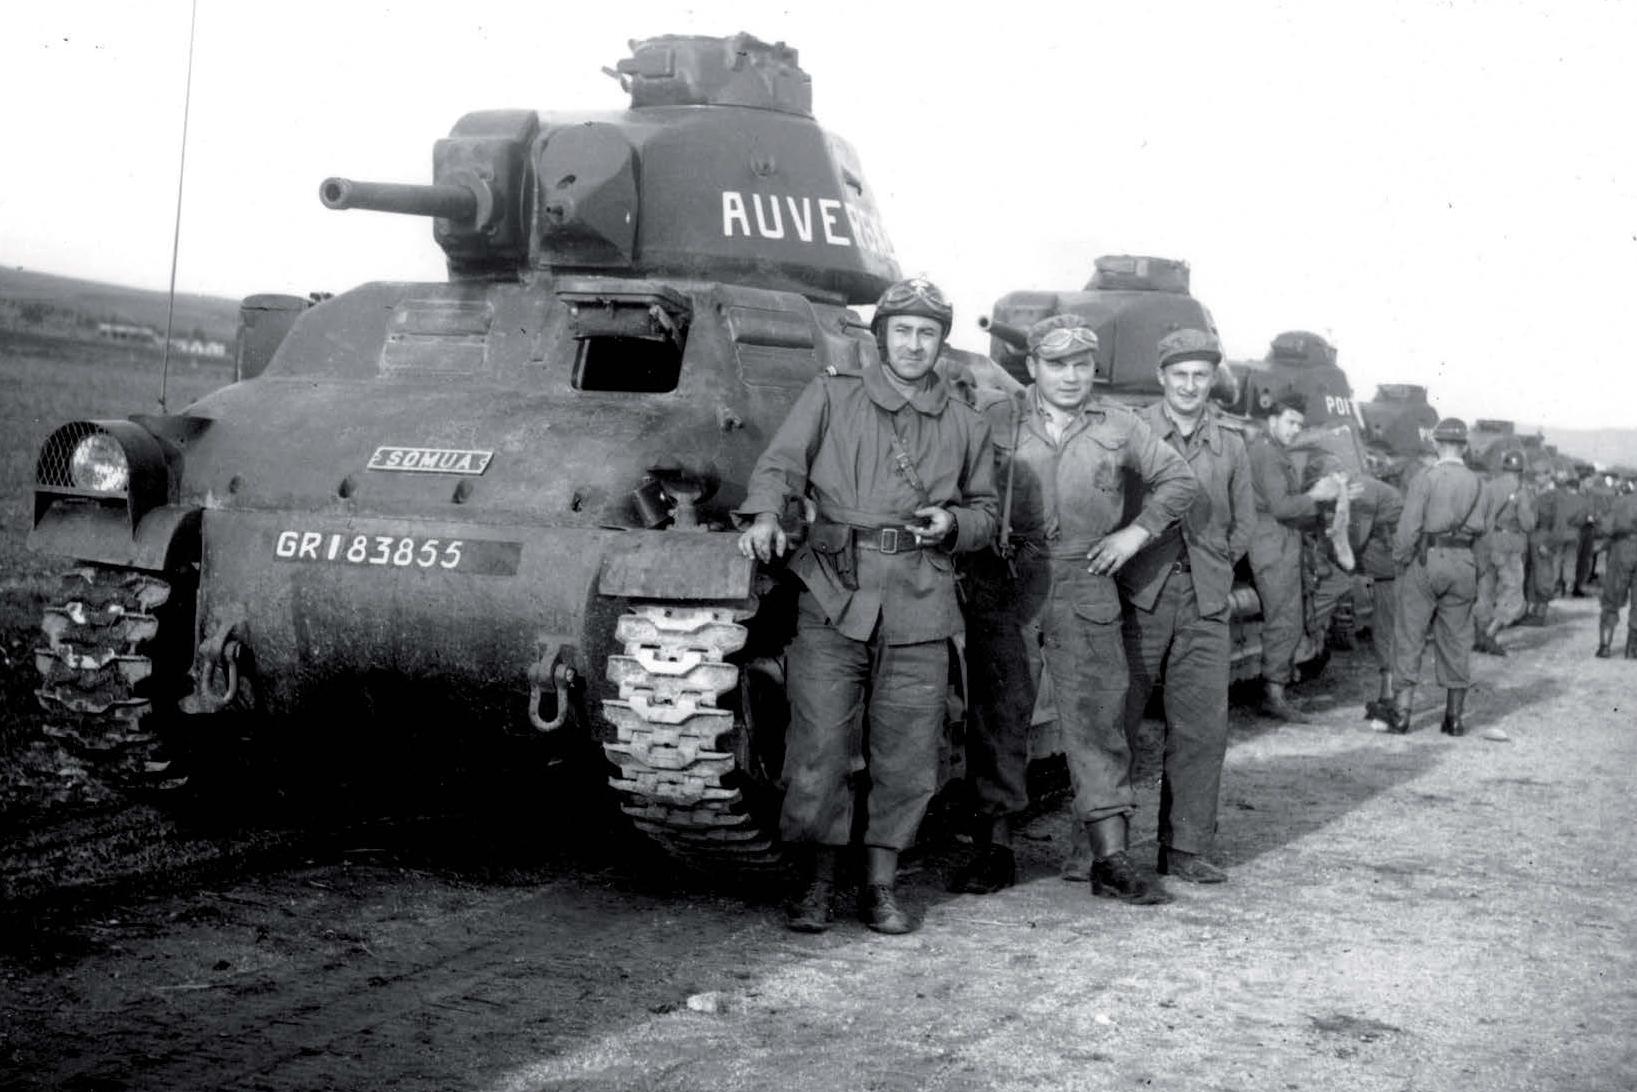 Tanques Somua S35 do Exército belga durante a batalha de Dunquerque